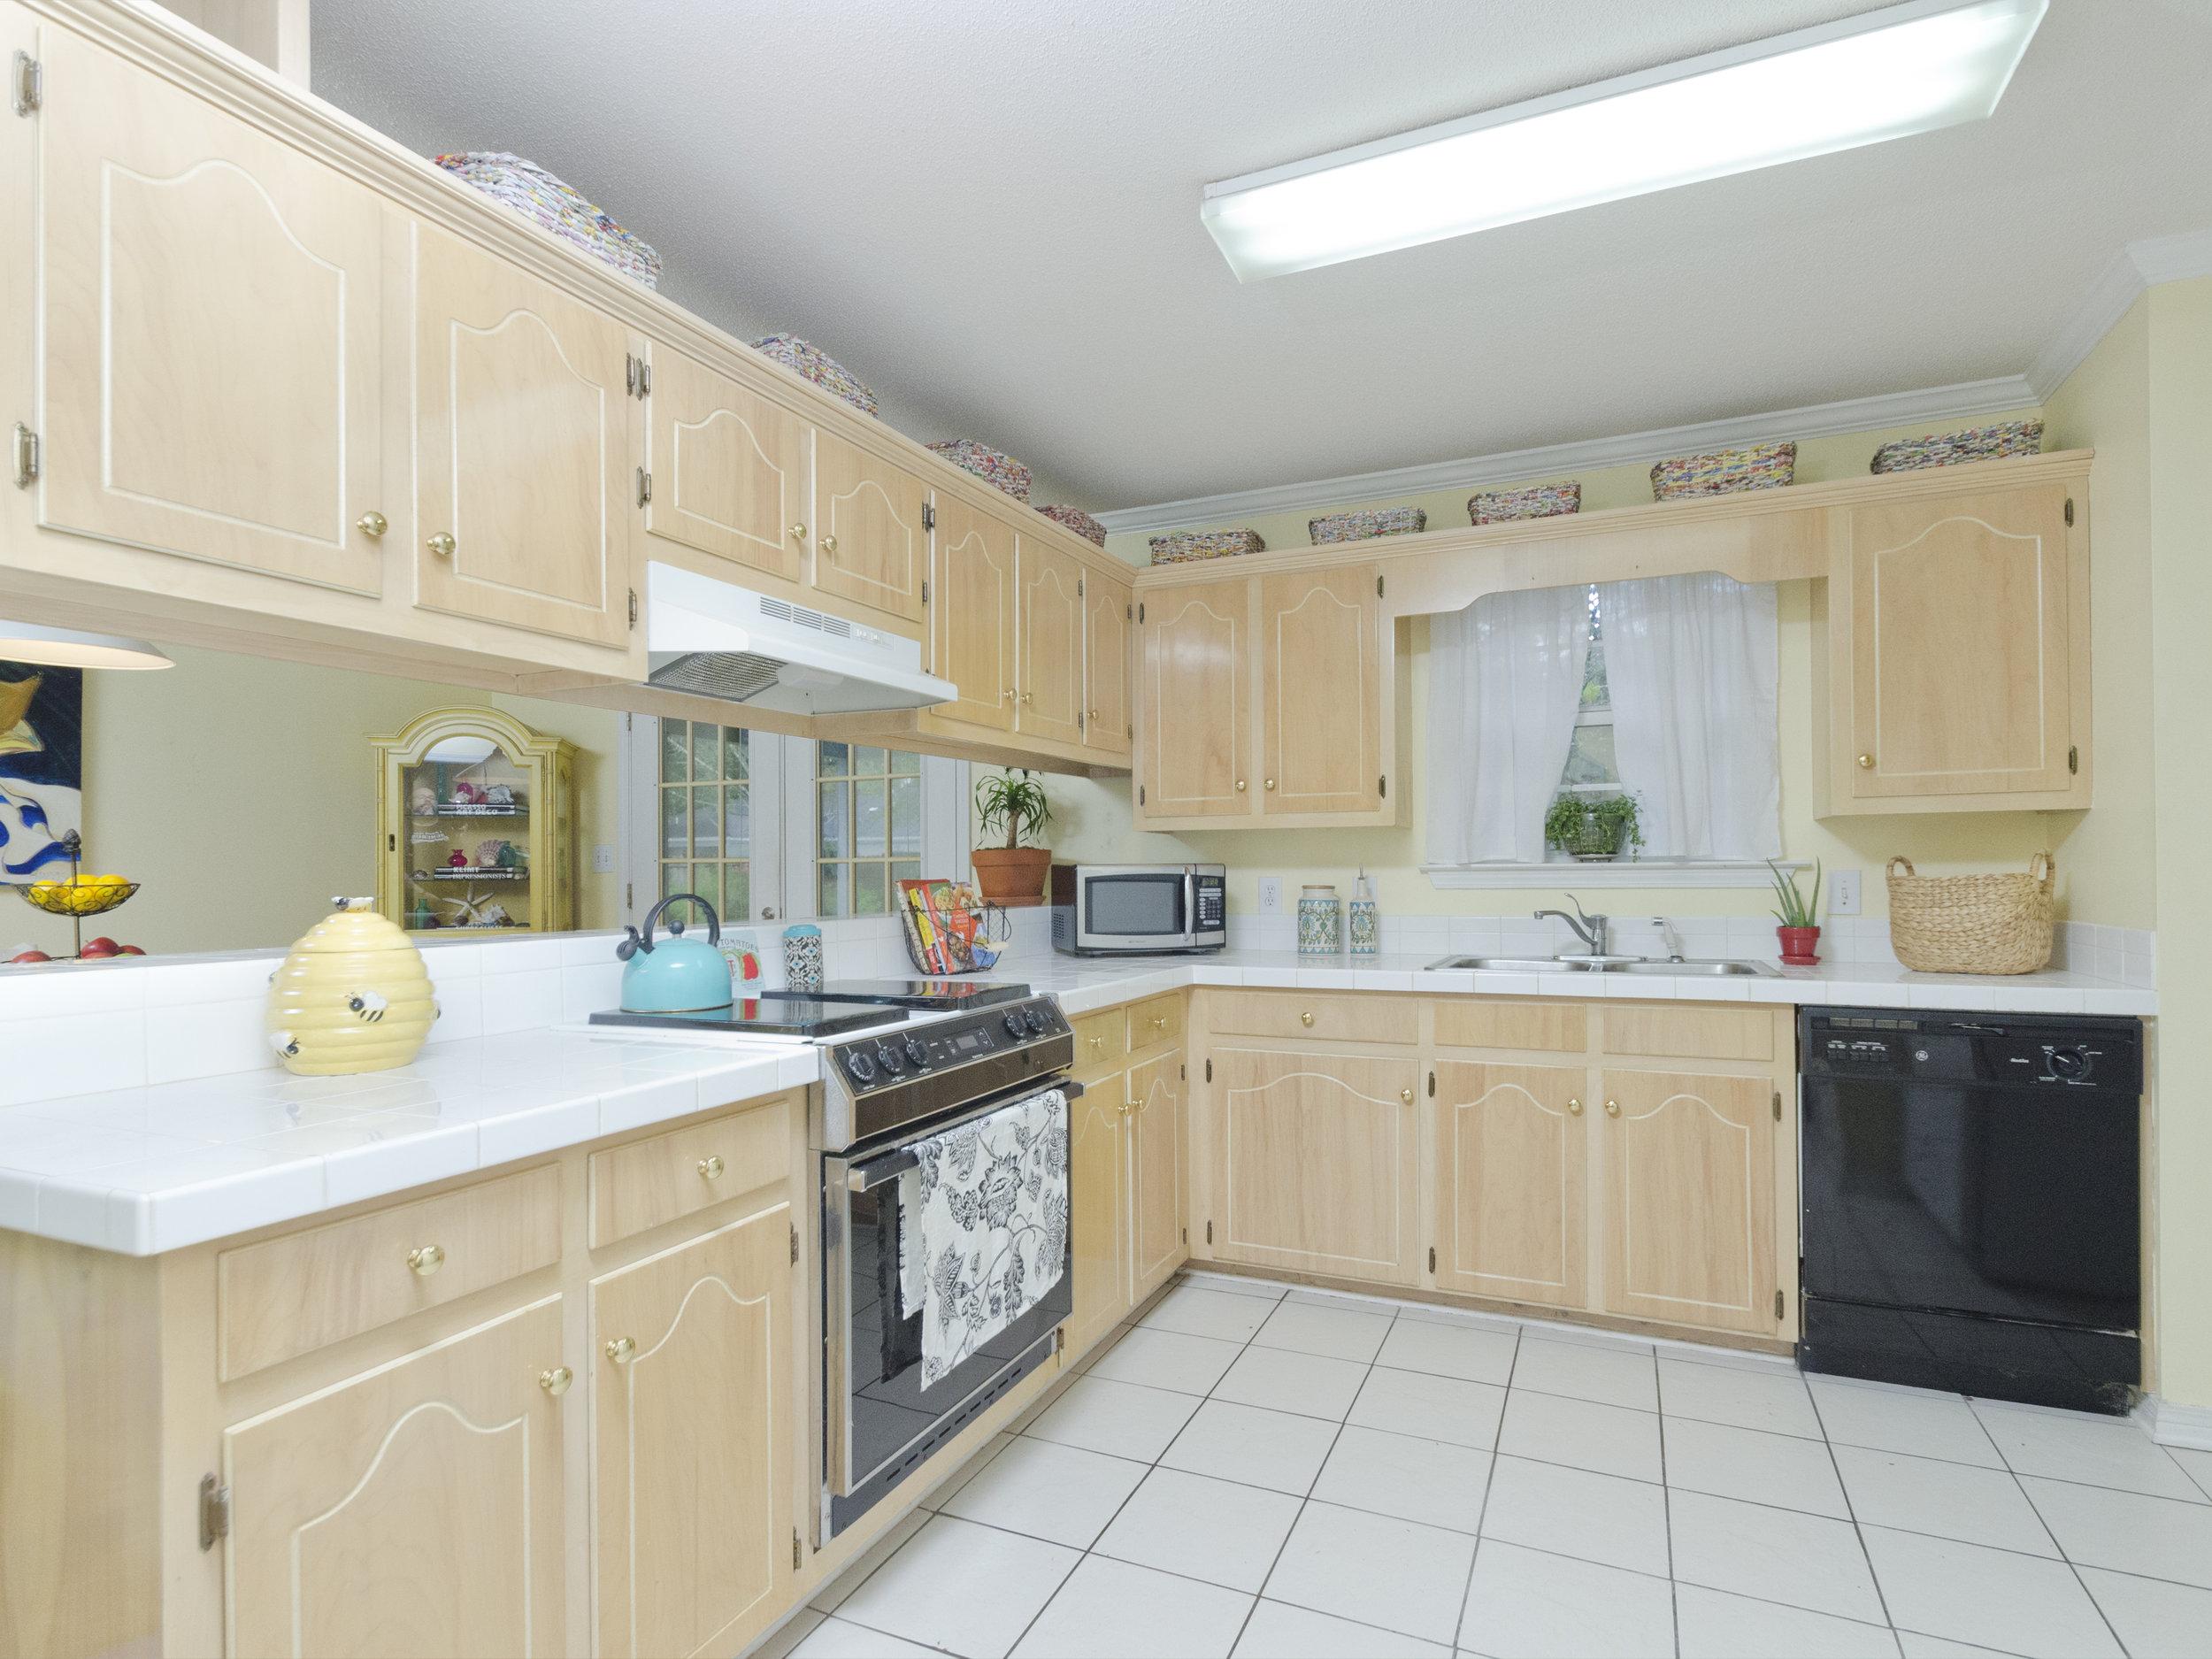 Kitchen Back_RLT0564.jpg